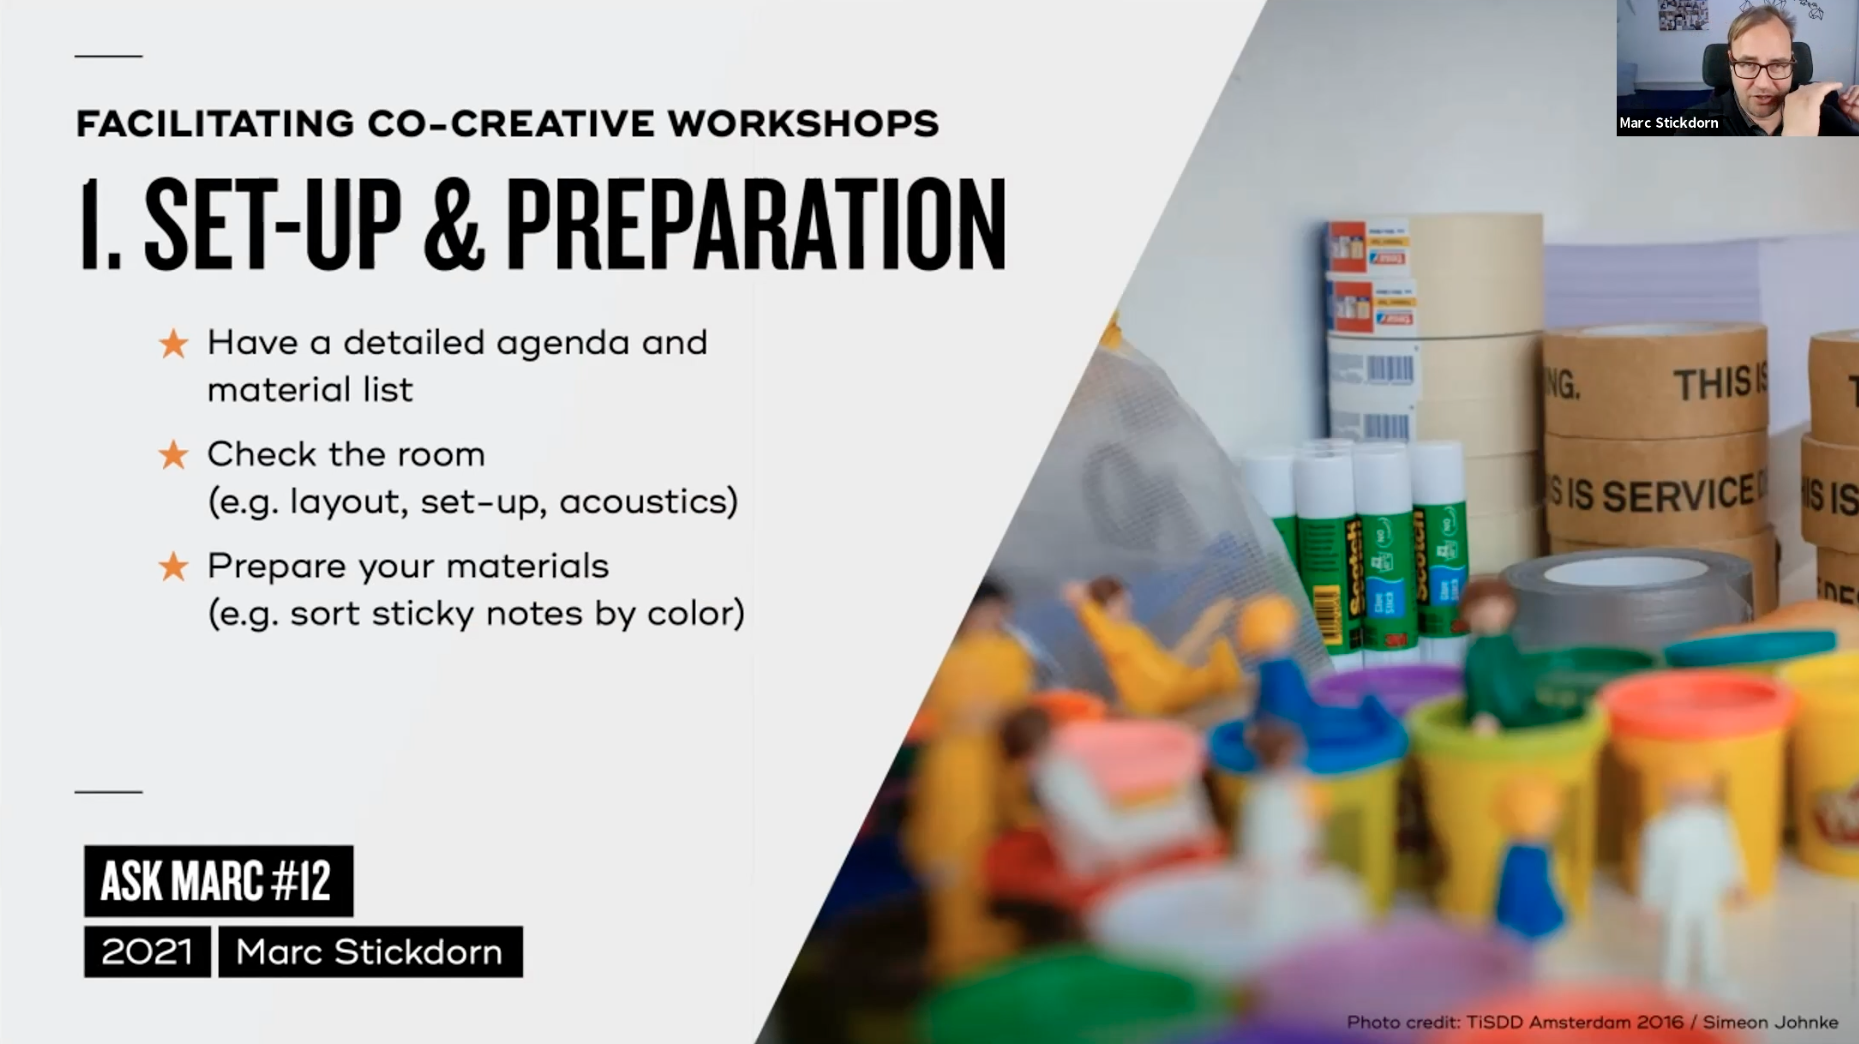 Tip 1: Set up and preparation